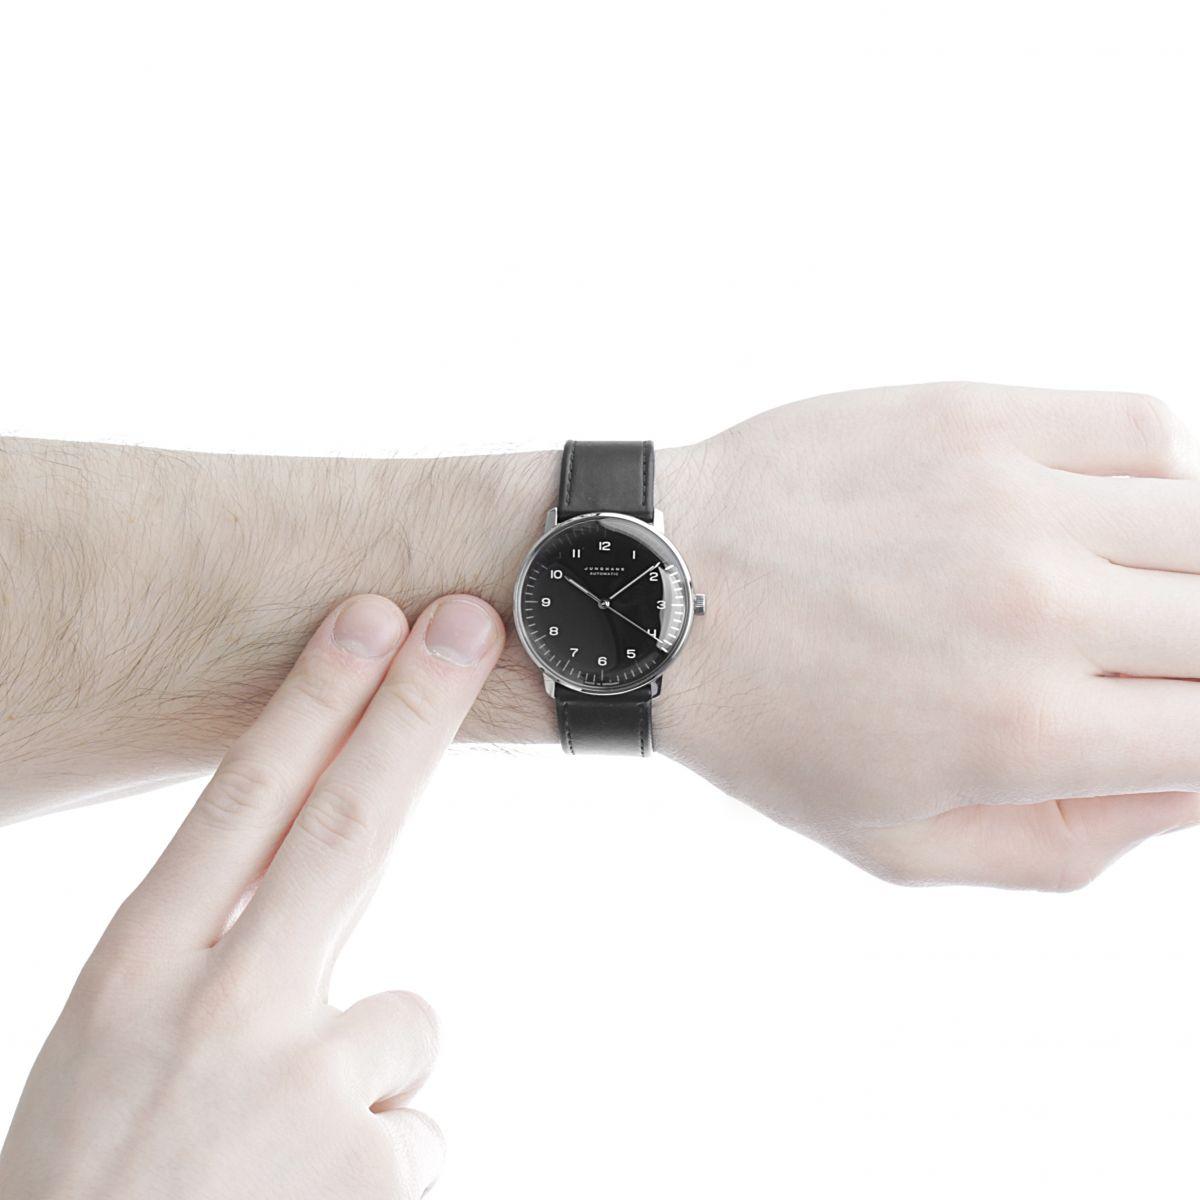 gents junghans max bill watch 027. Black Bedroom Furniture Sets. Home Design Ideas